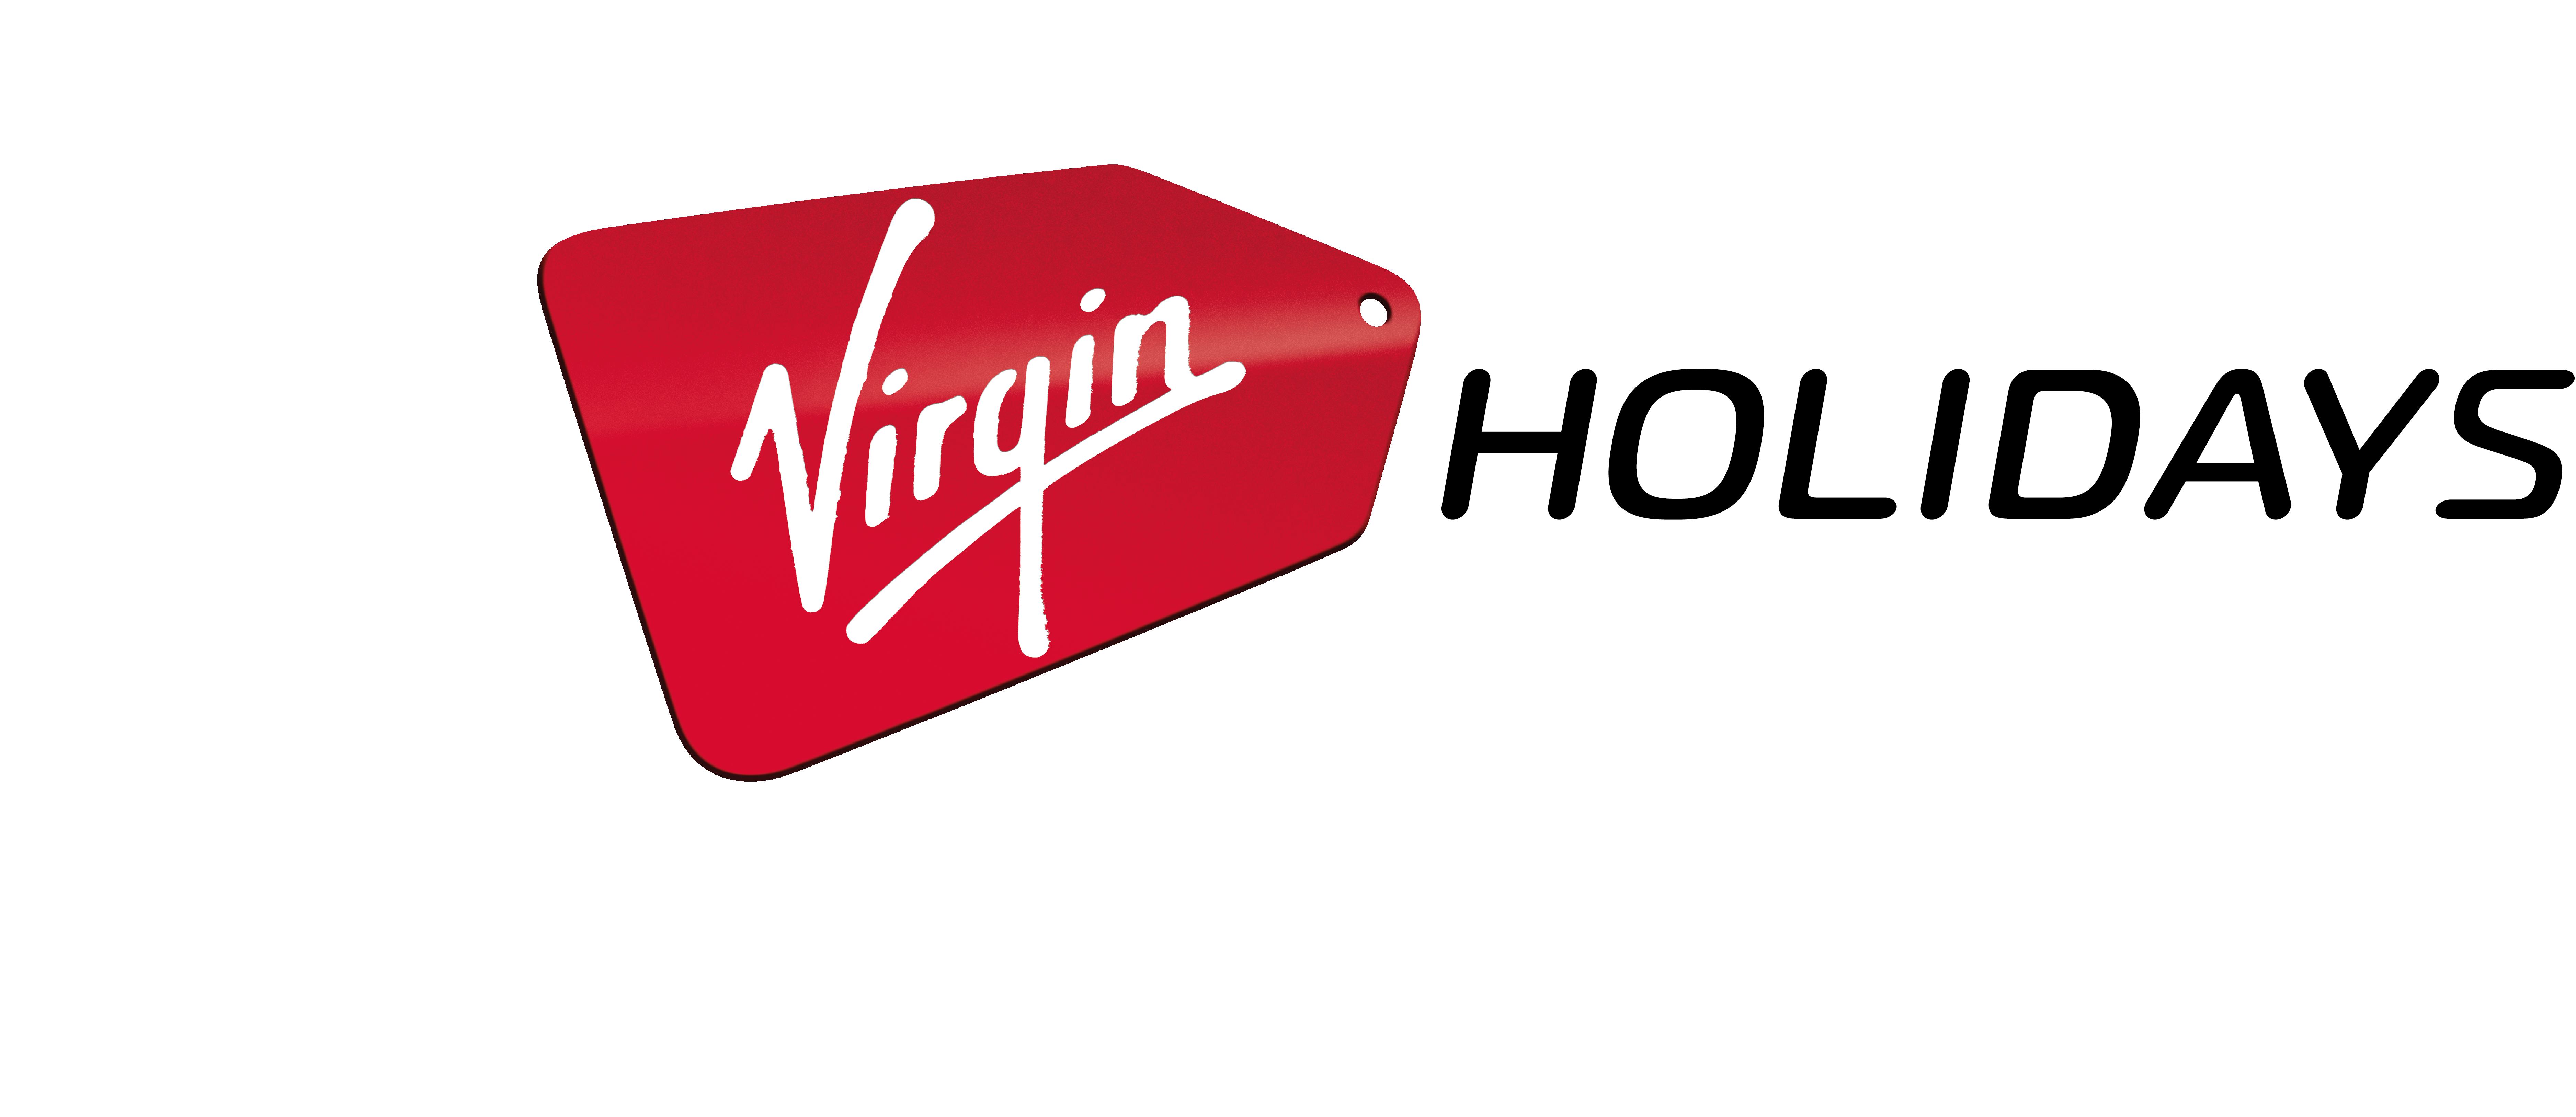 Affinity Promo Codes Virgin Holidays